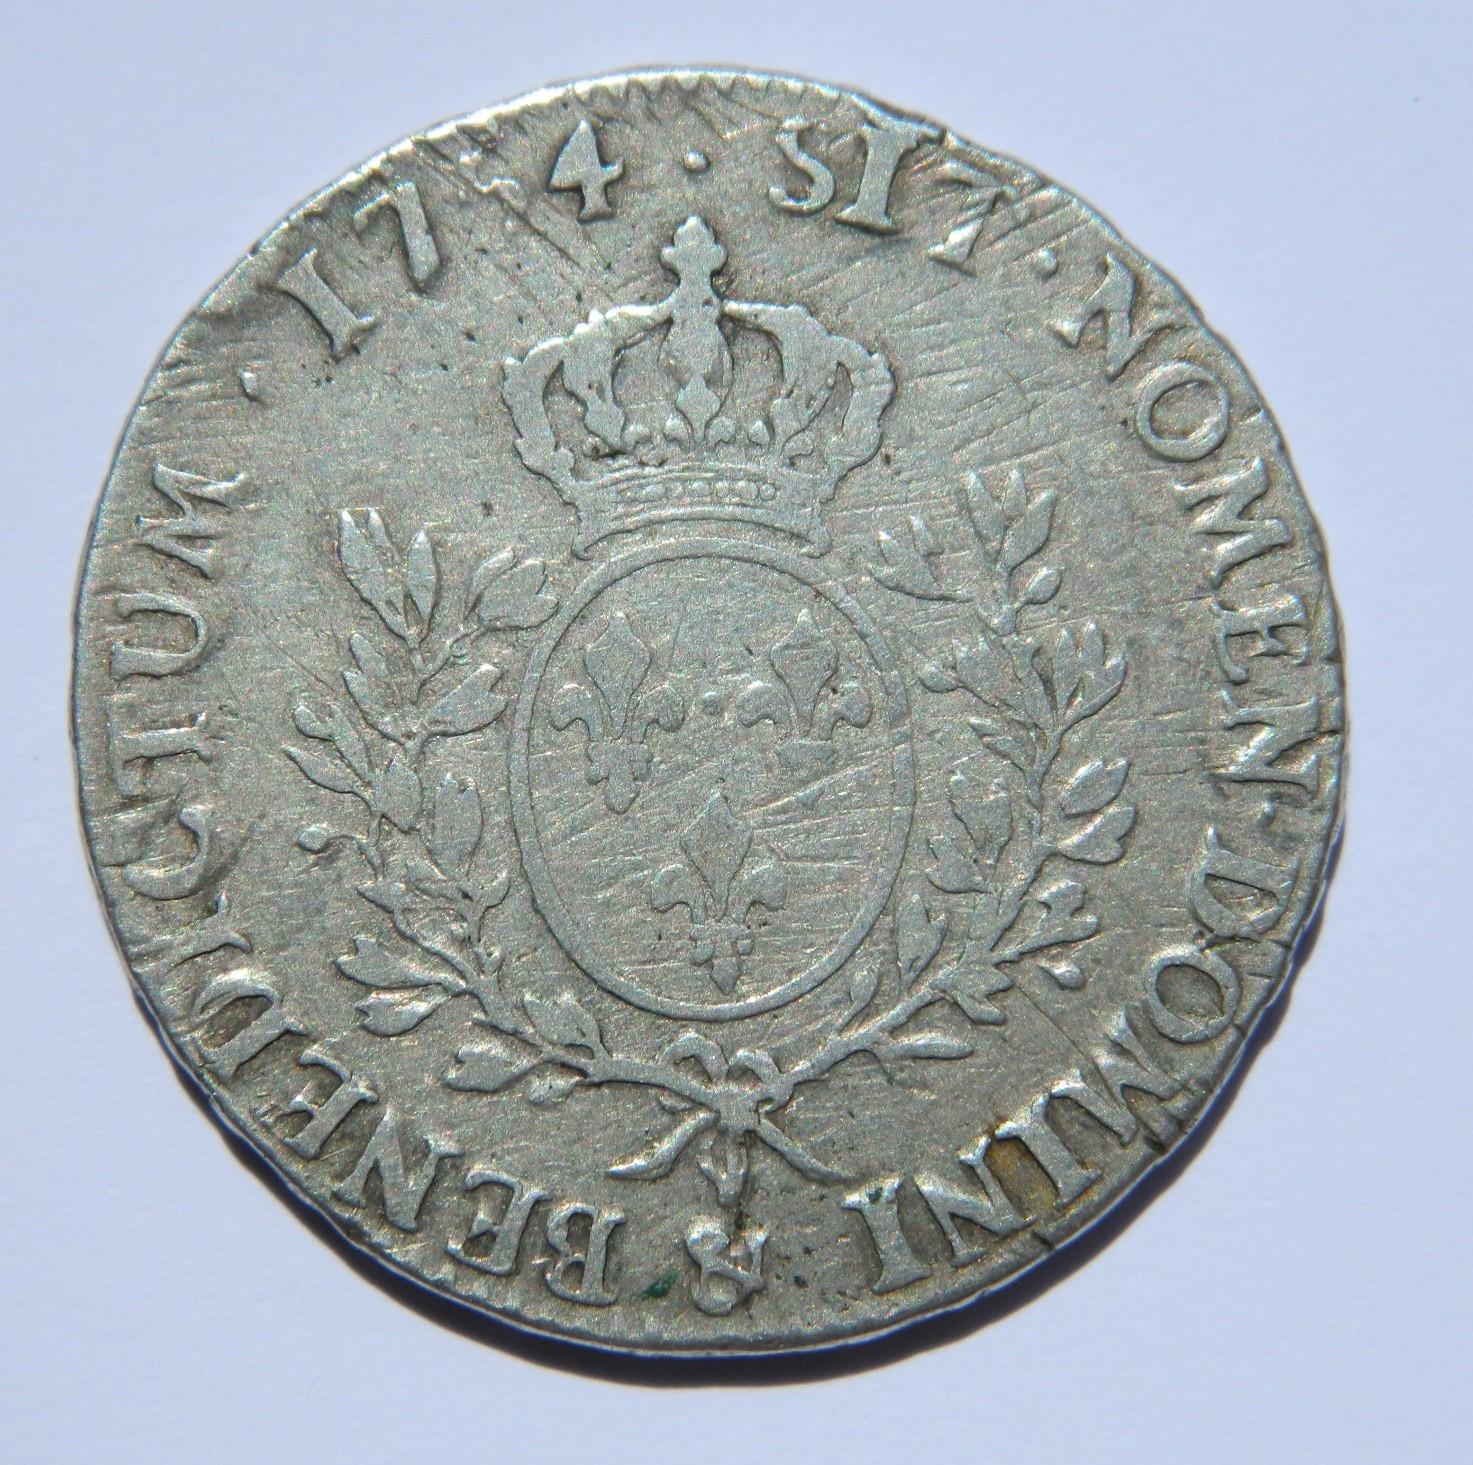 RY025 ECU LOUIS XV AU BANDEAU 1754 &